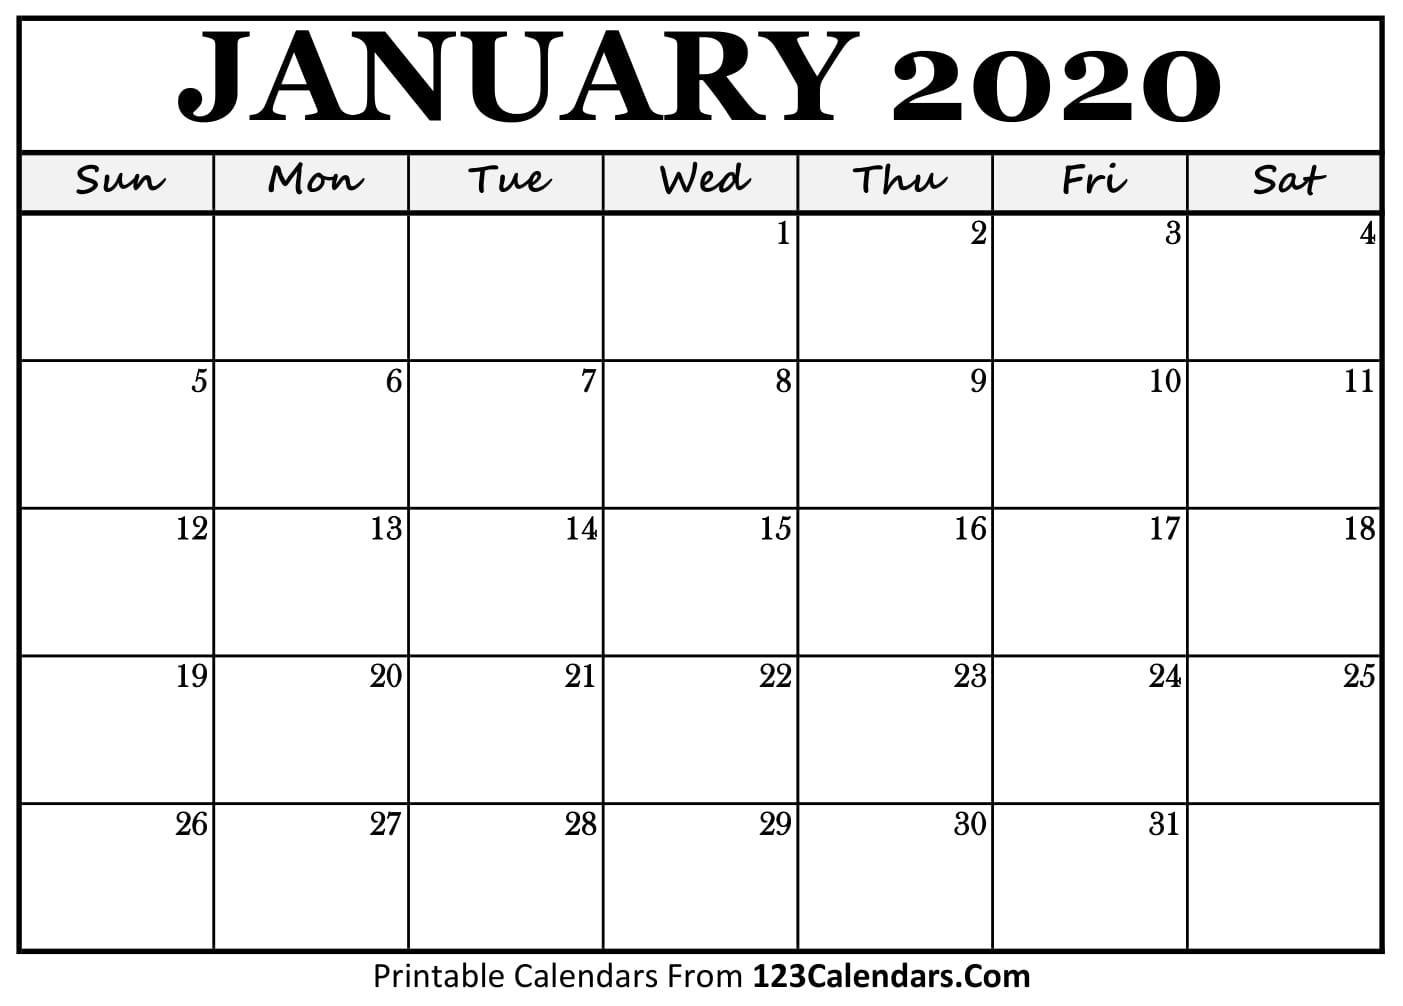 Free Printable Calendar | 123Calendars regarding 2020 Printable Fill In Calendar